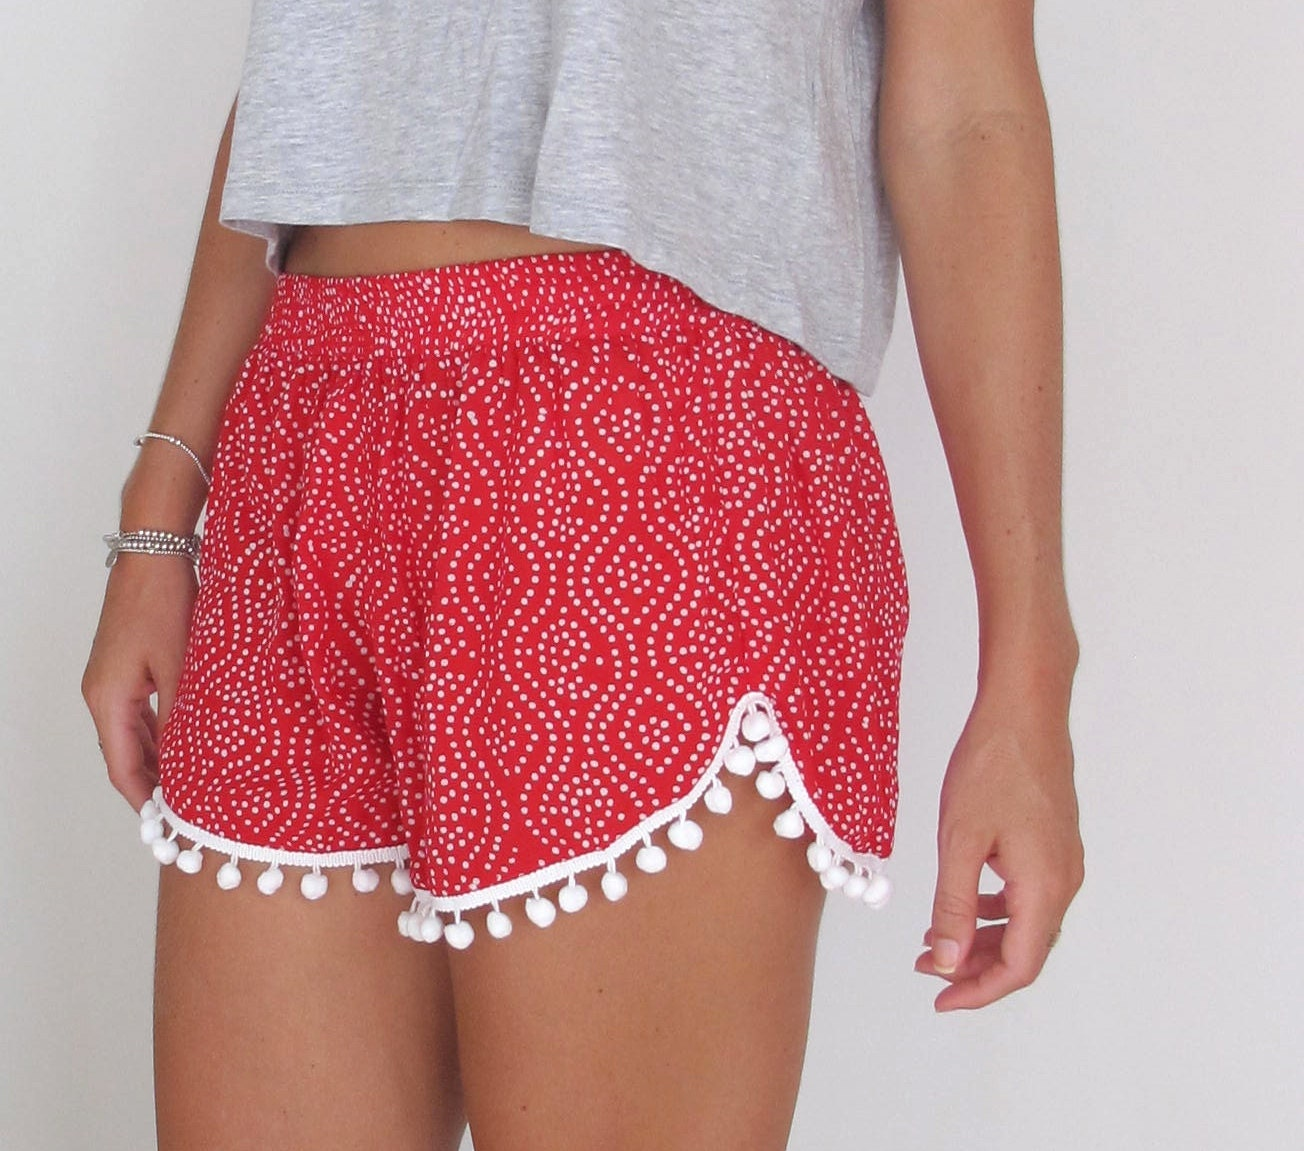 Christmas Pom Pom Shorts Red and White Polkadot Print